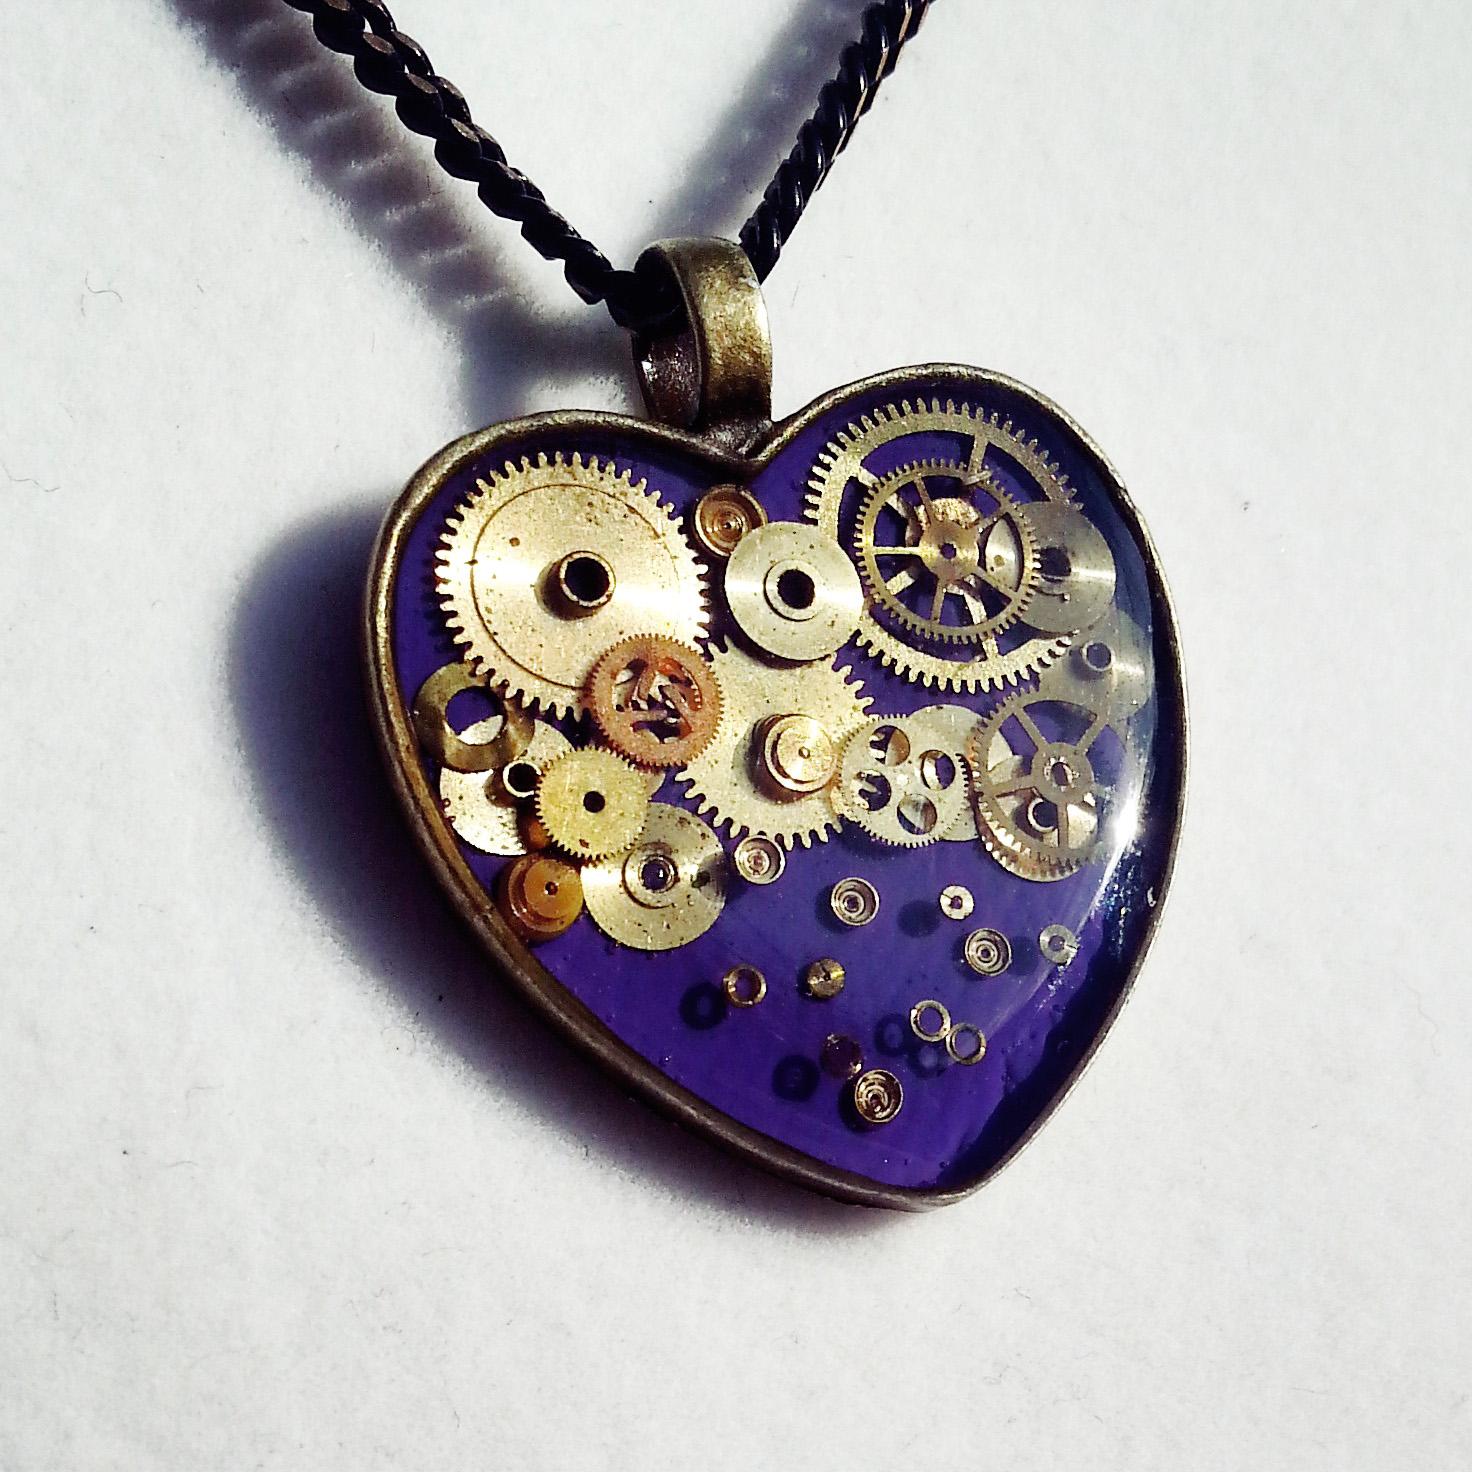 aminda-wood-purple-mechanical-heart.jpg